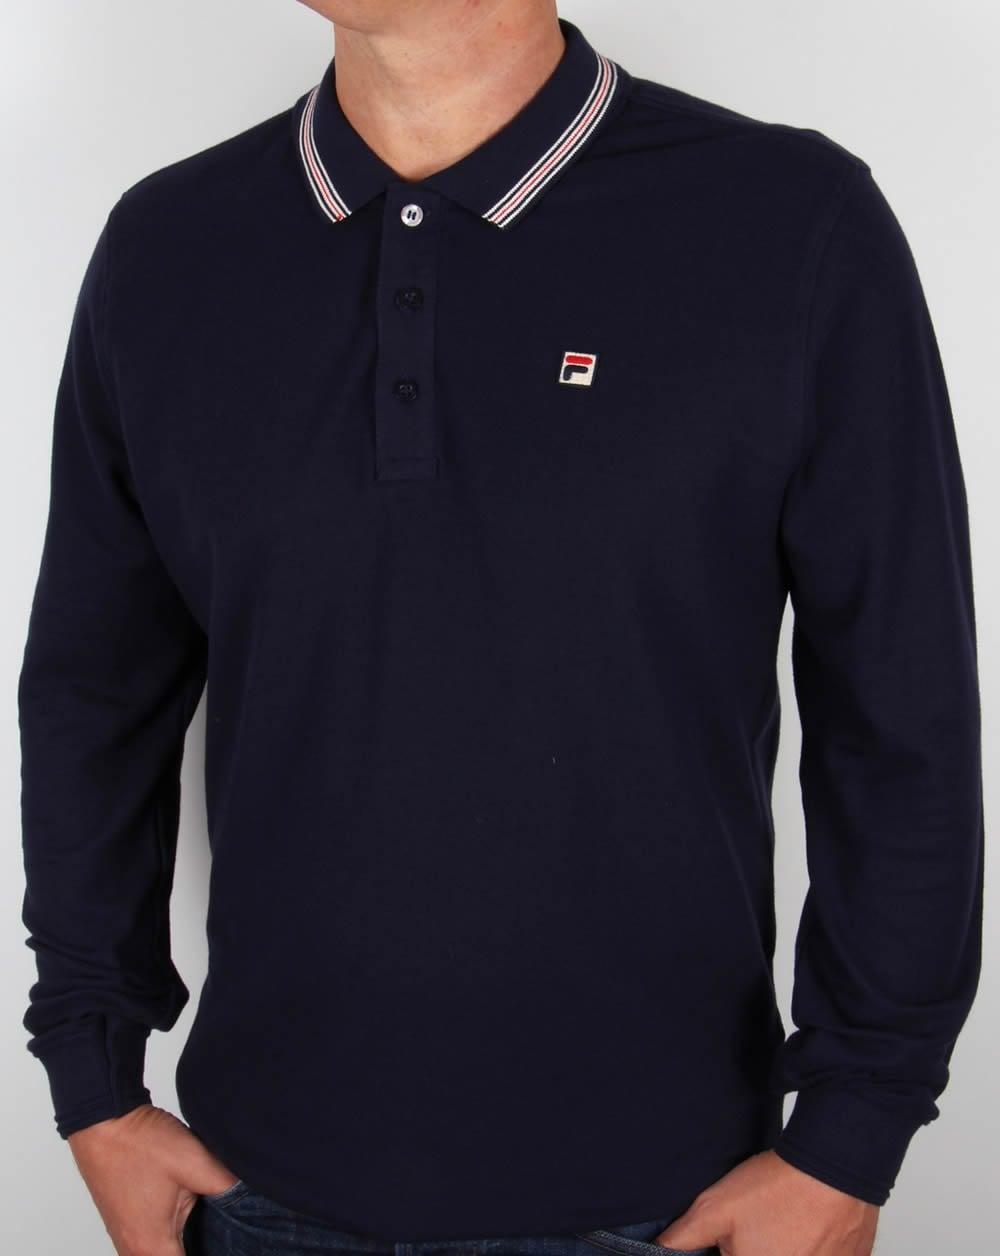 Fila Vintage Tipped Long Sleeve Polo Shirt Navy